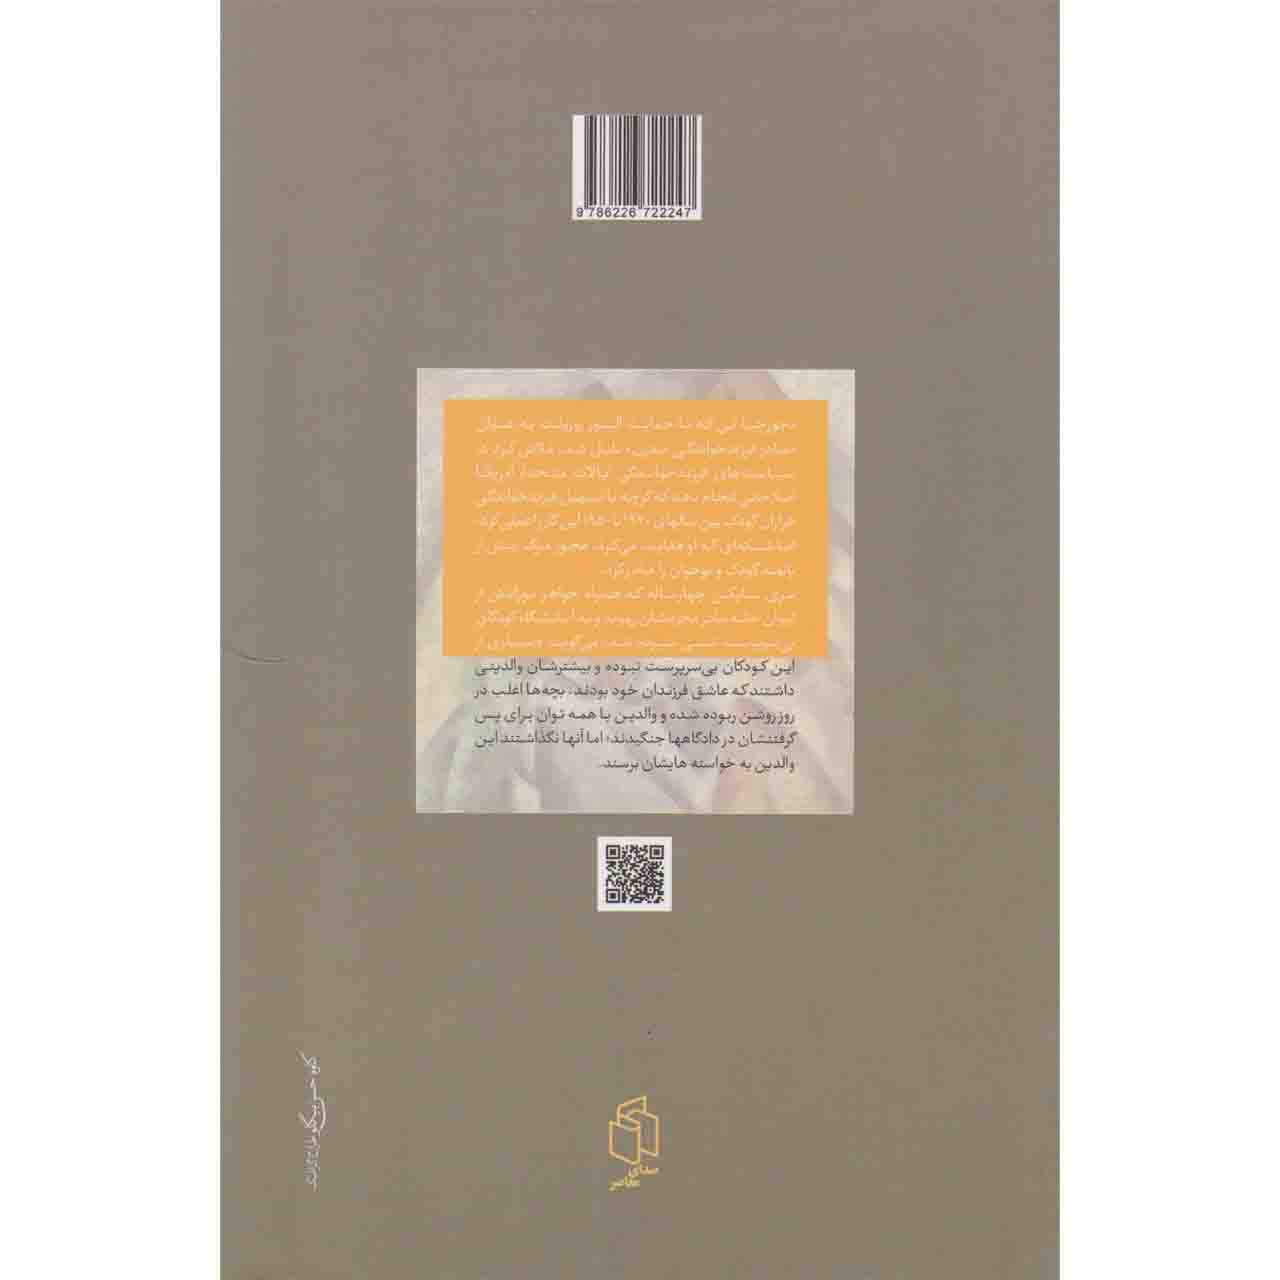 کتاب تا پیش از آنکه مال تو شویم اثر لیسا وینگیت نشر صدای معاصر